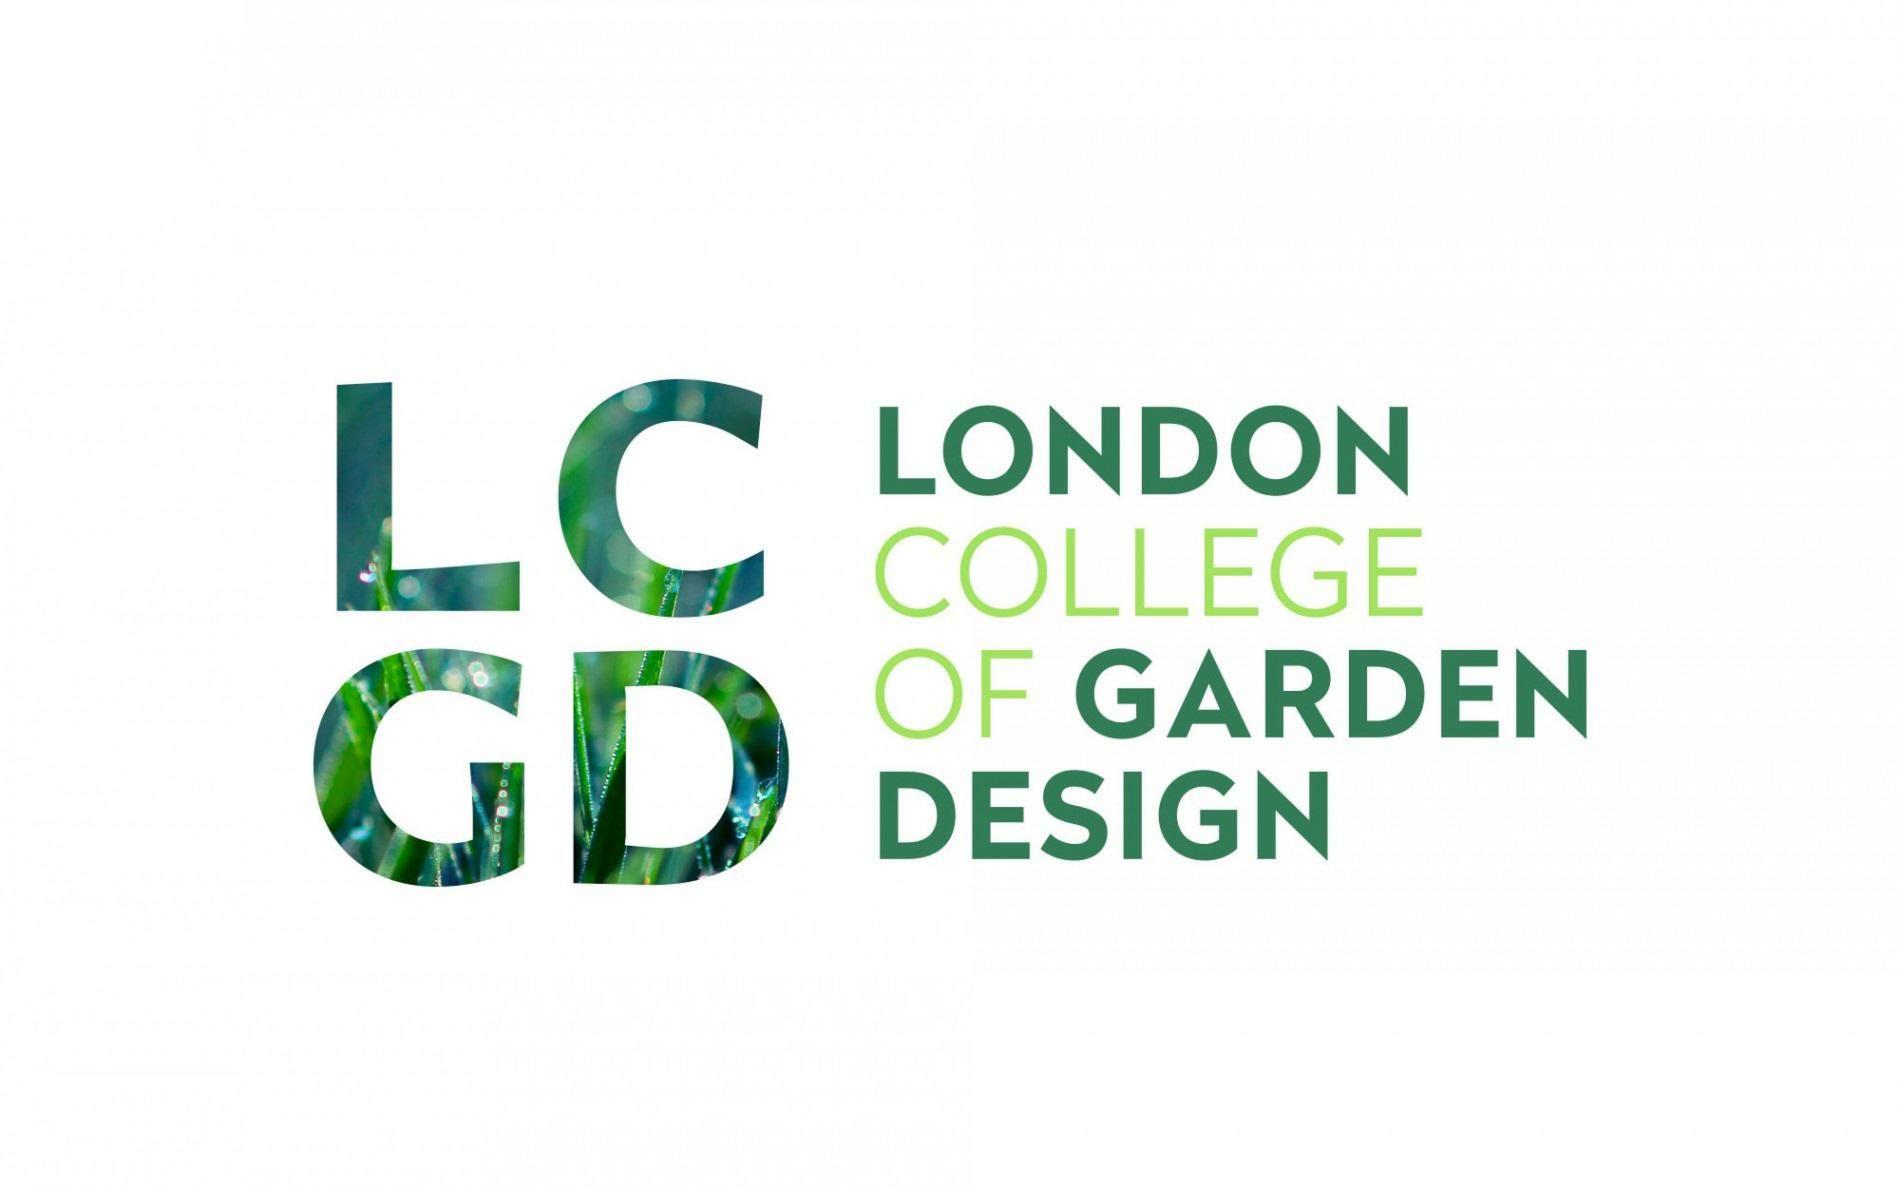 London College of Garden Design